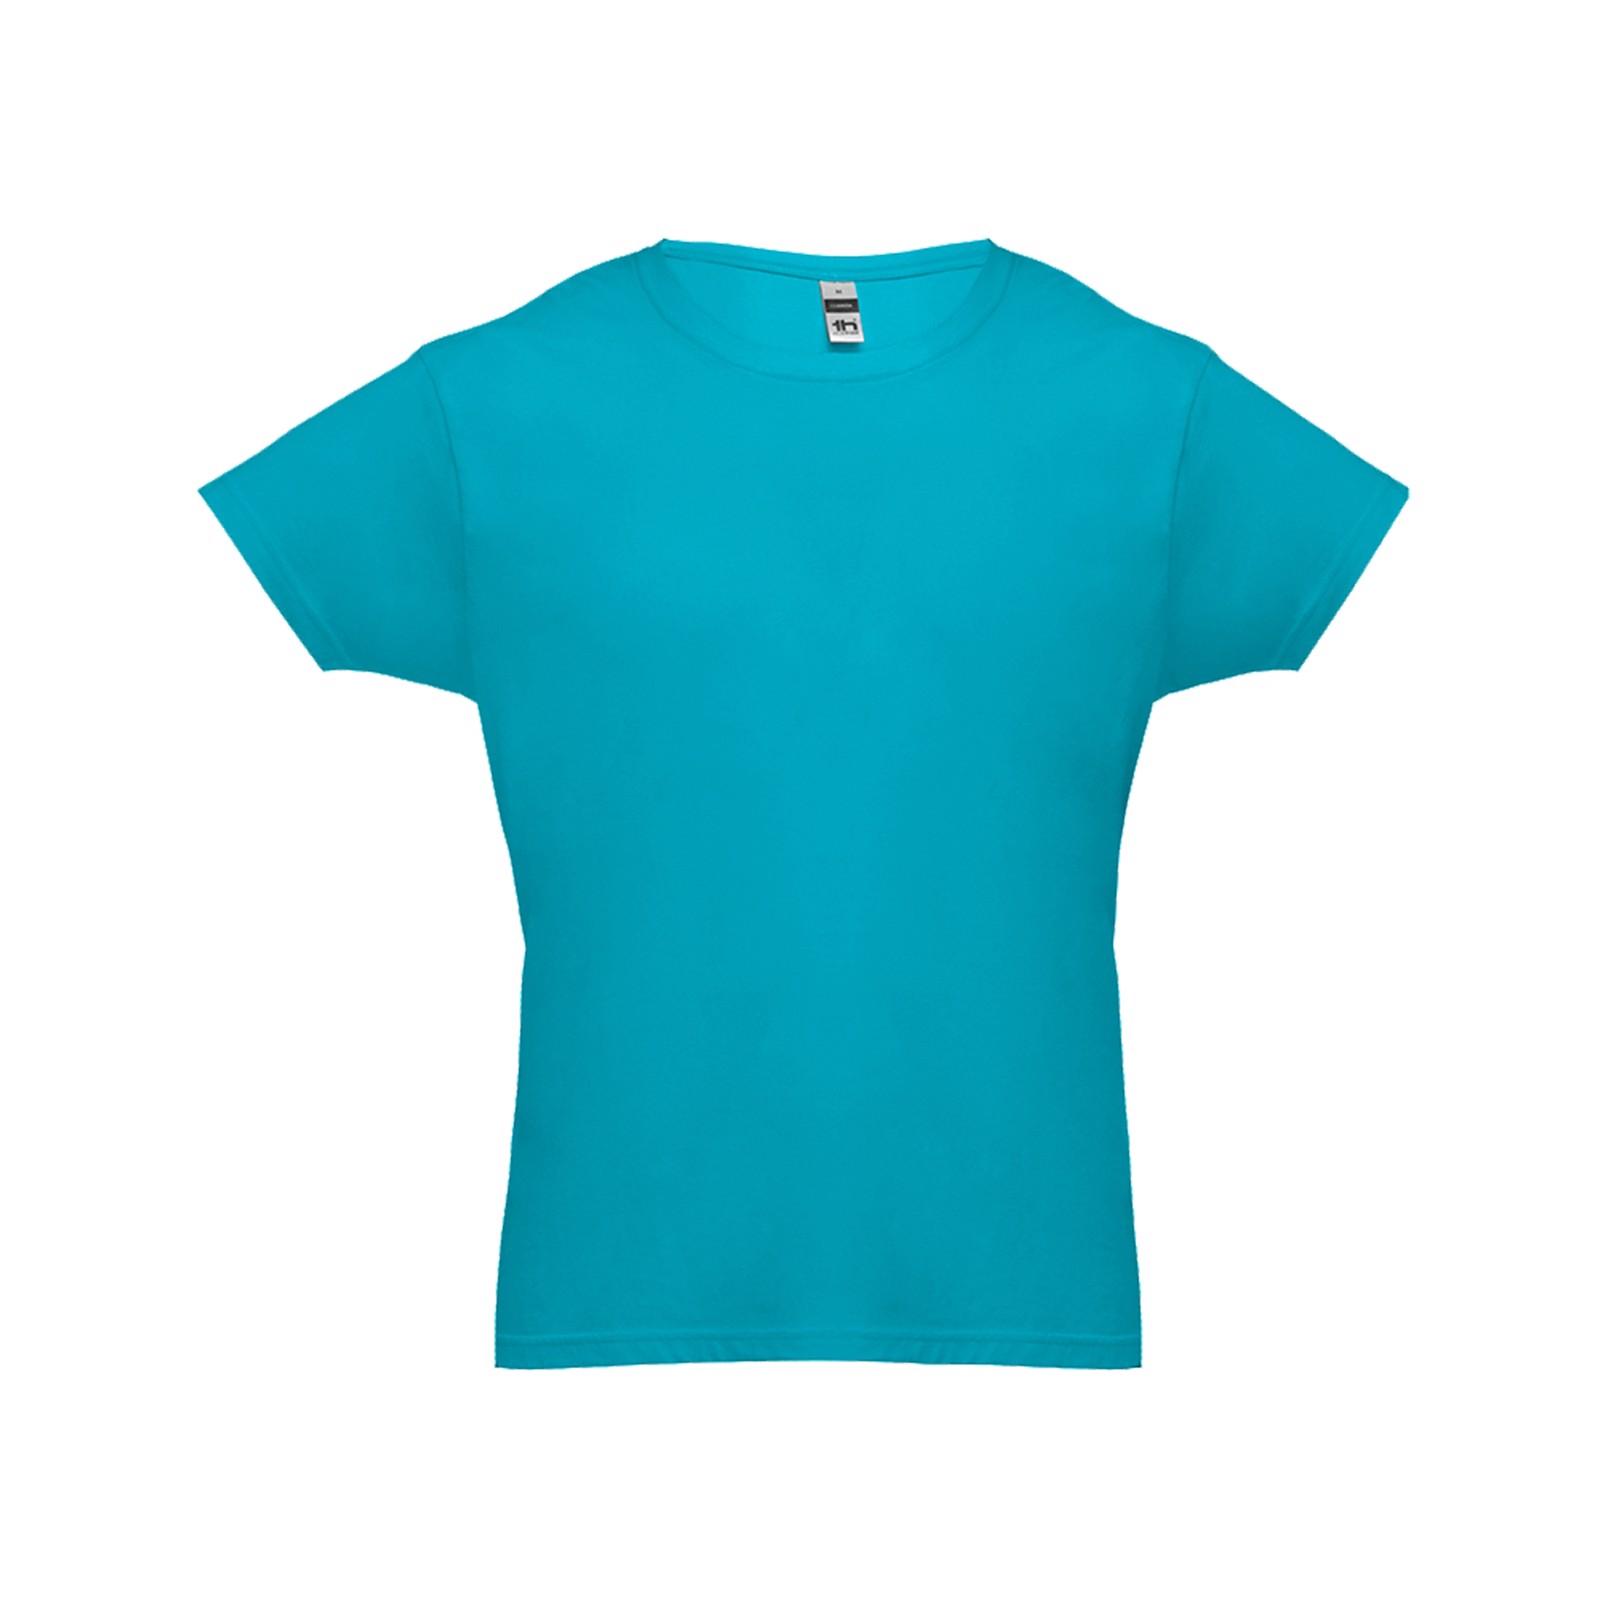 LUANDA. Men's t-shirt - Acqua Blue / 3XL